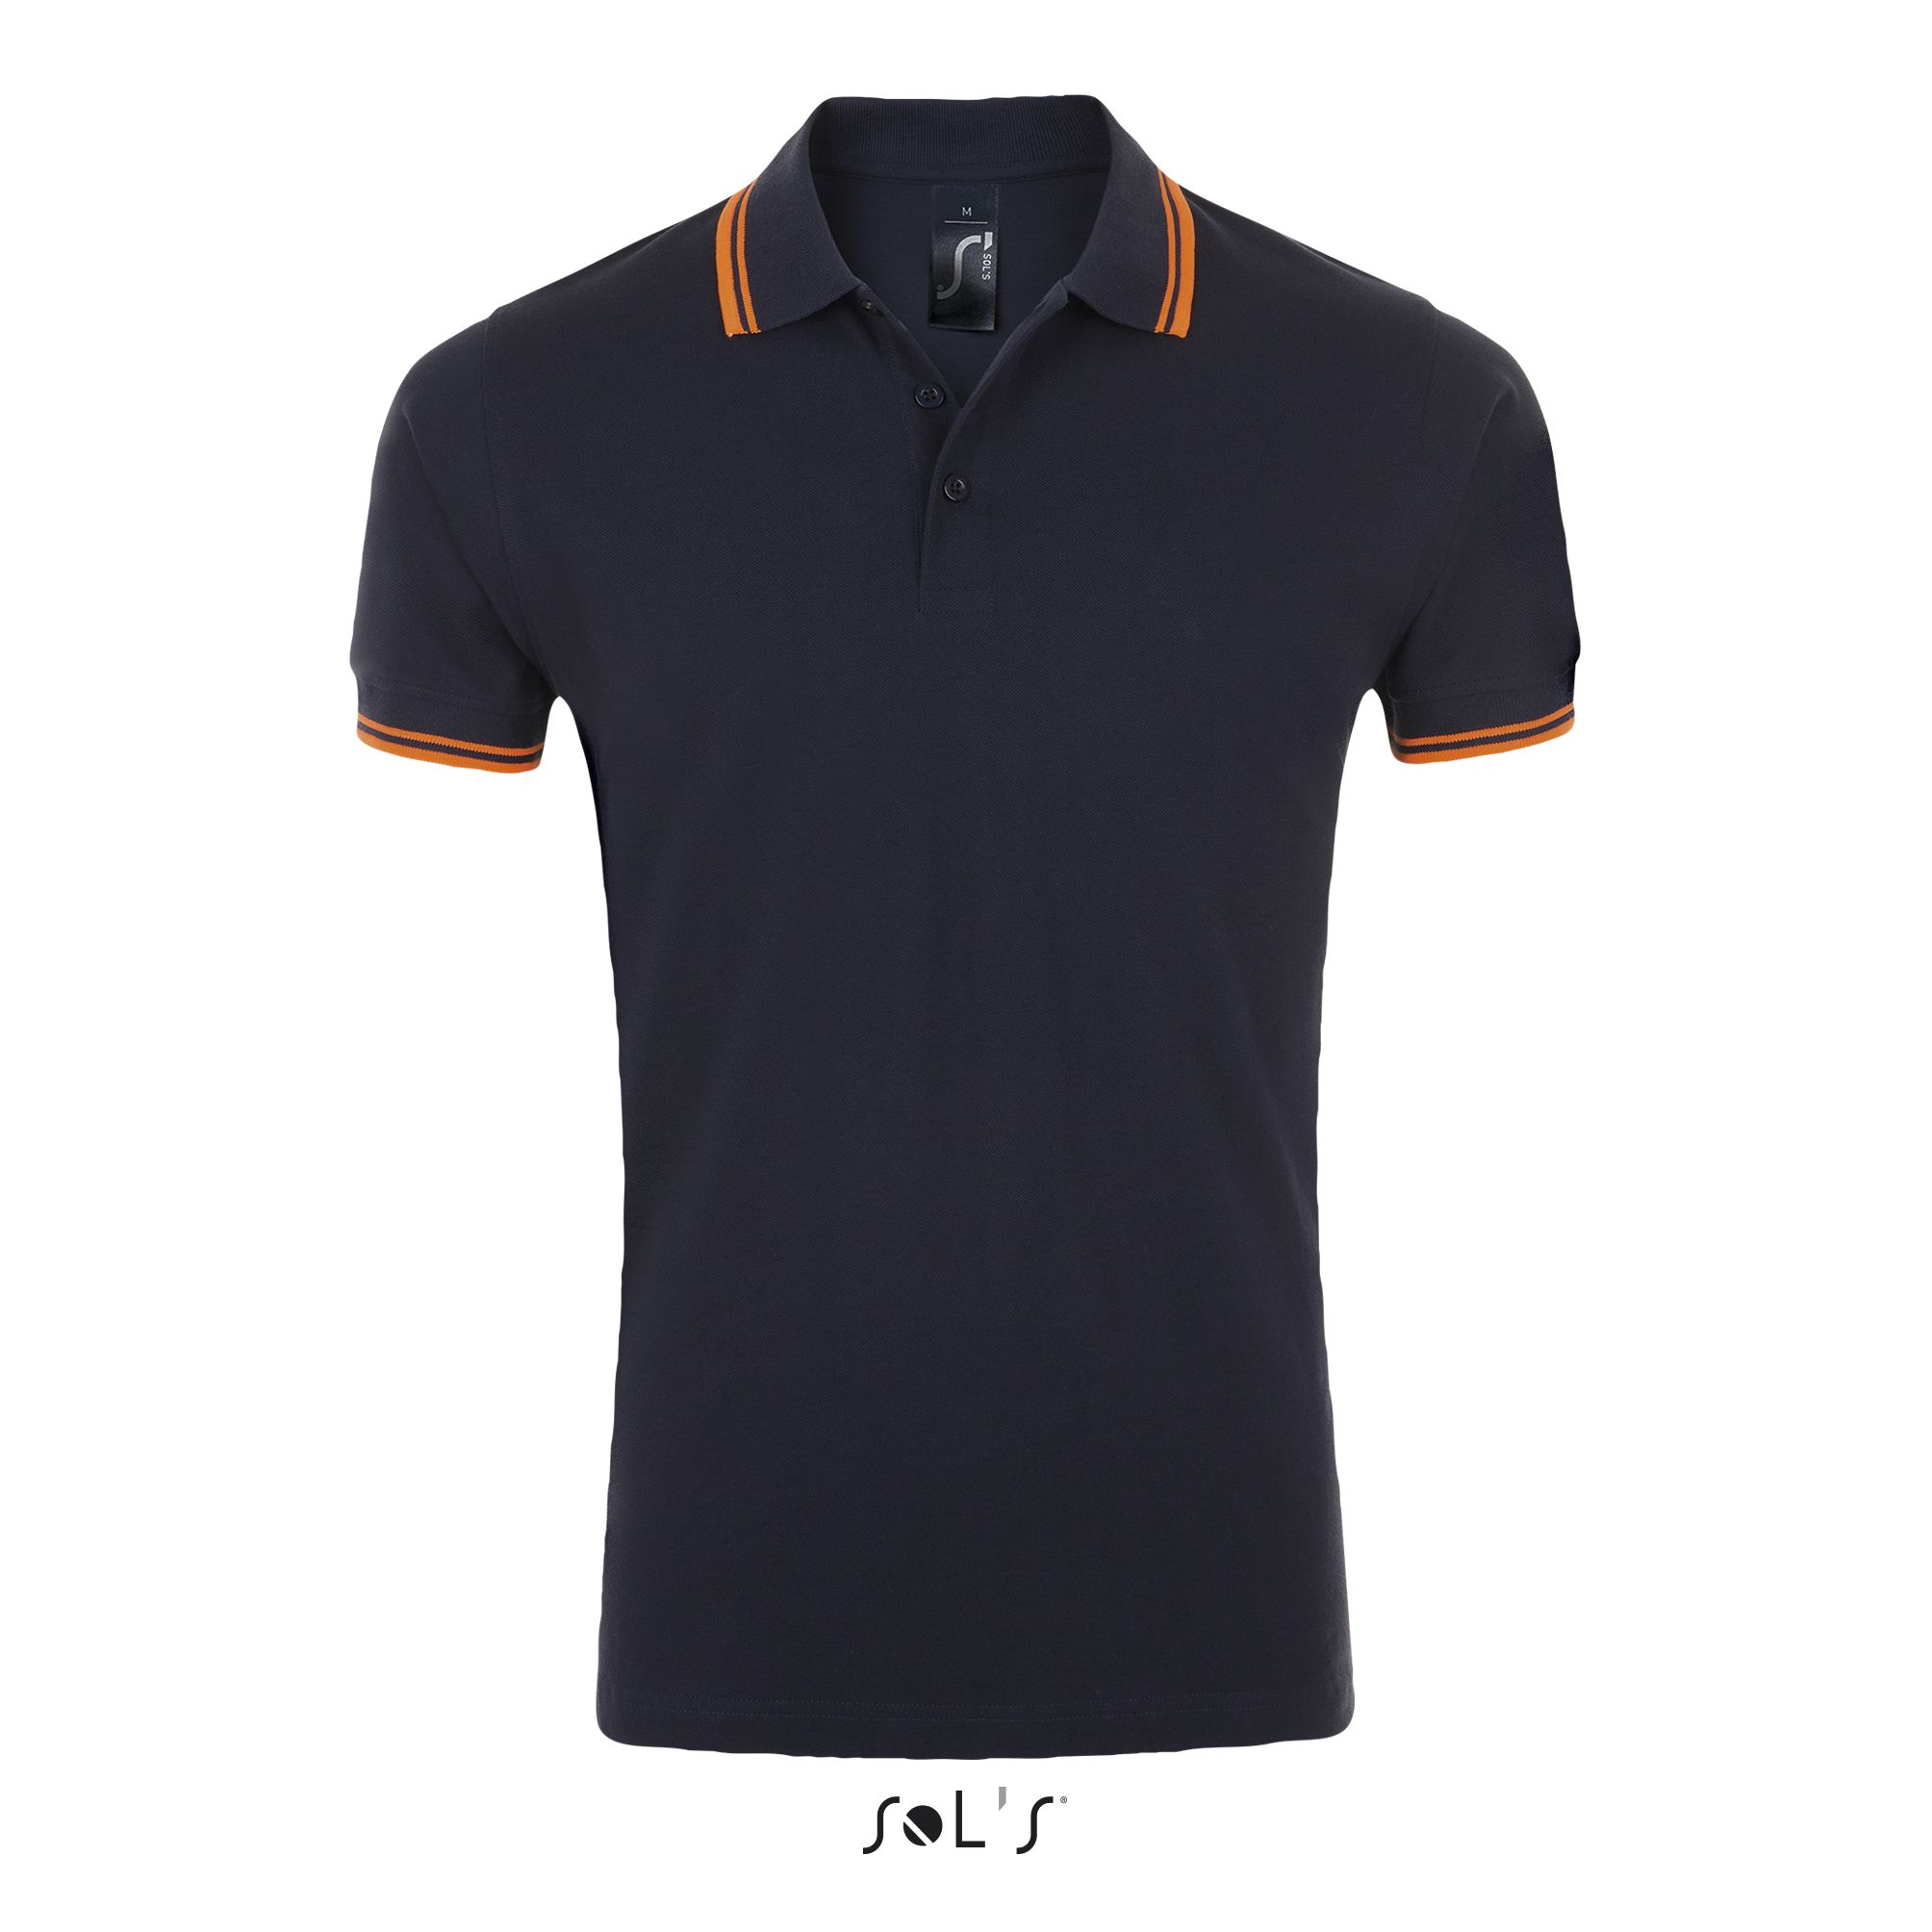 535 - French marine / Orange fluo